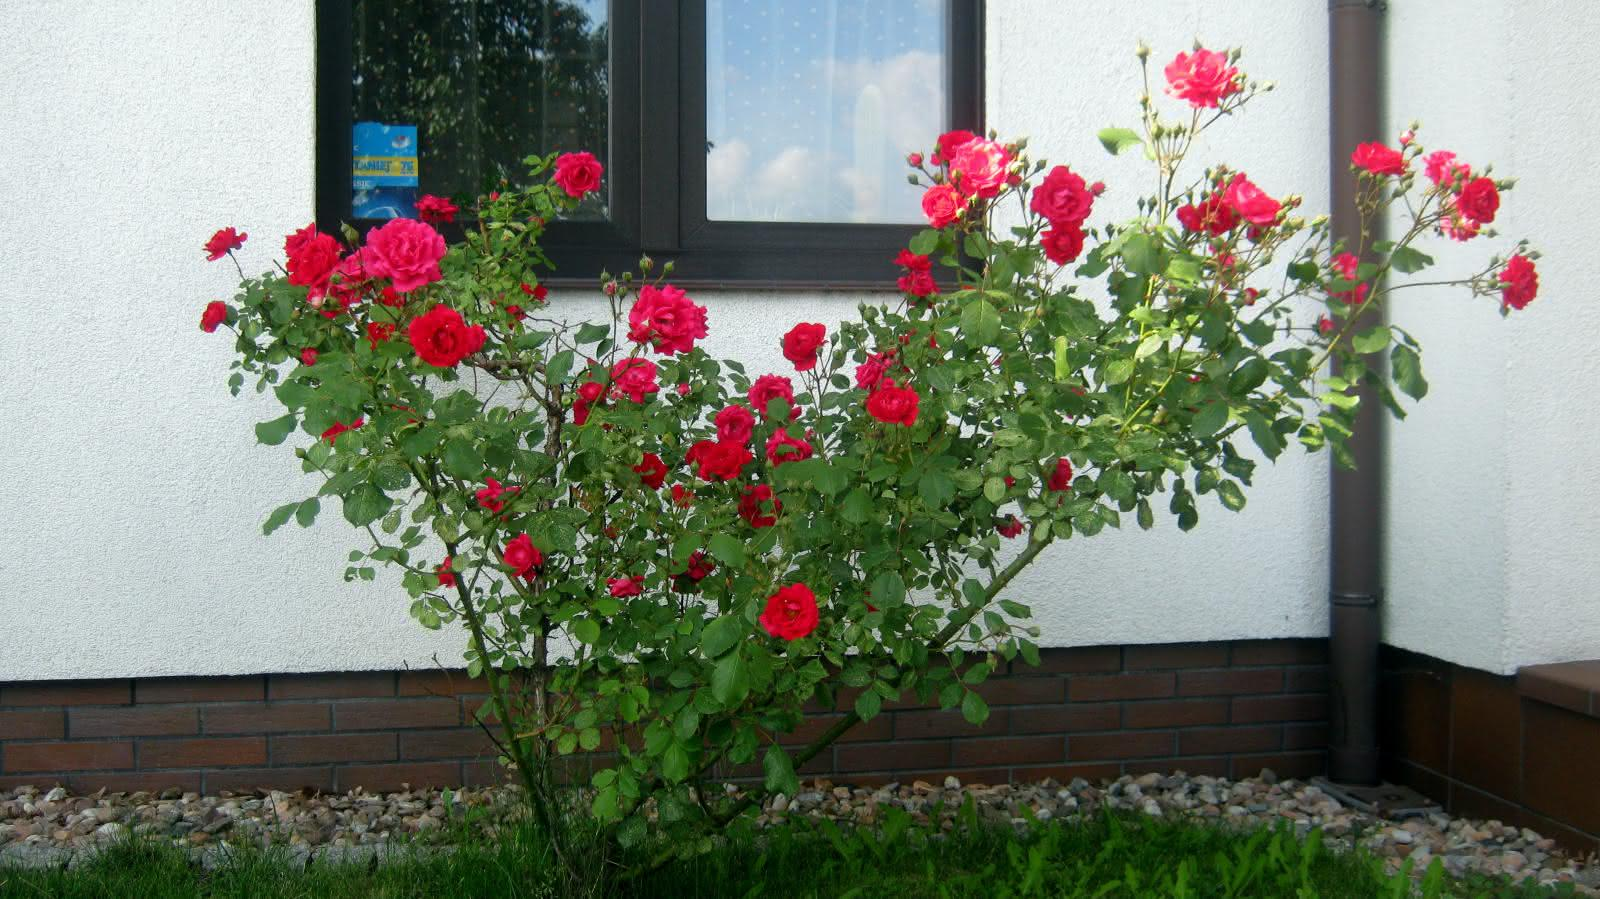 pod kuchennym oknem...  różano...